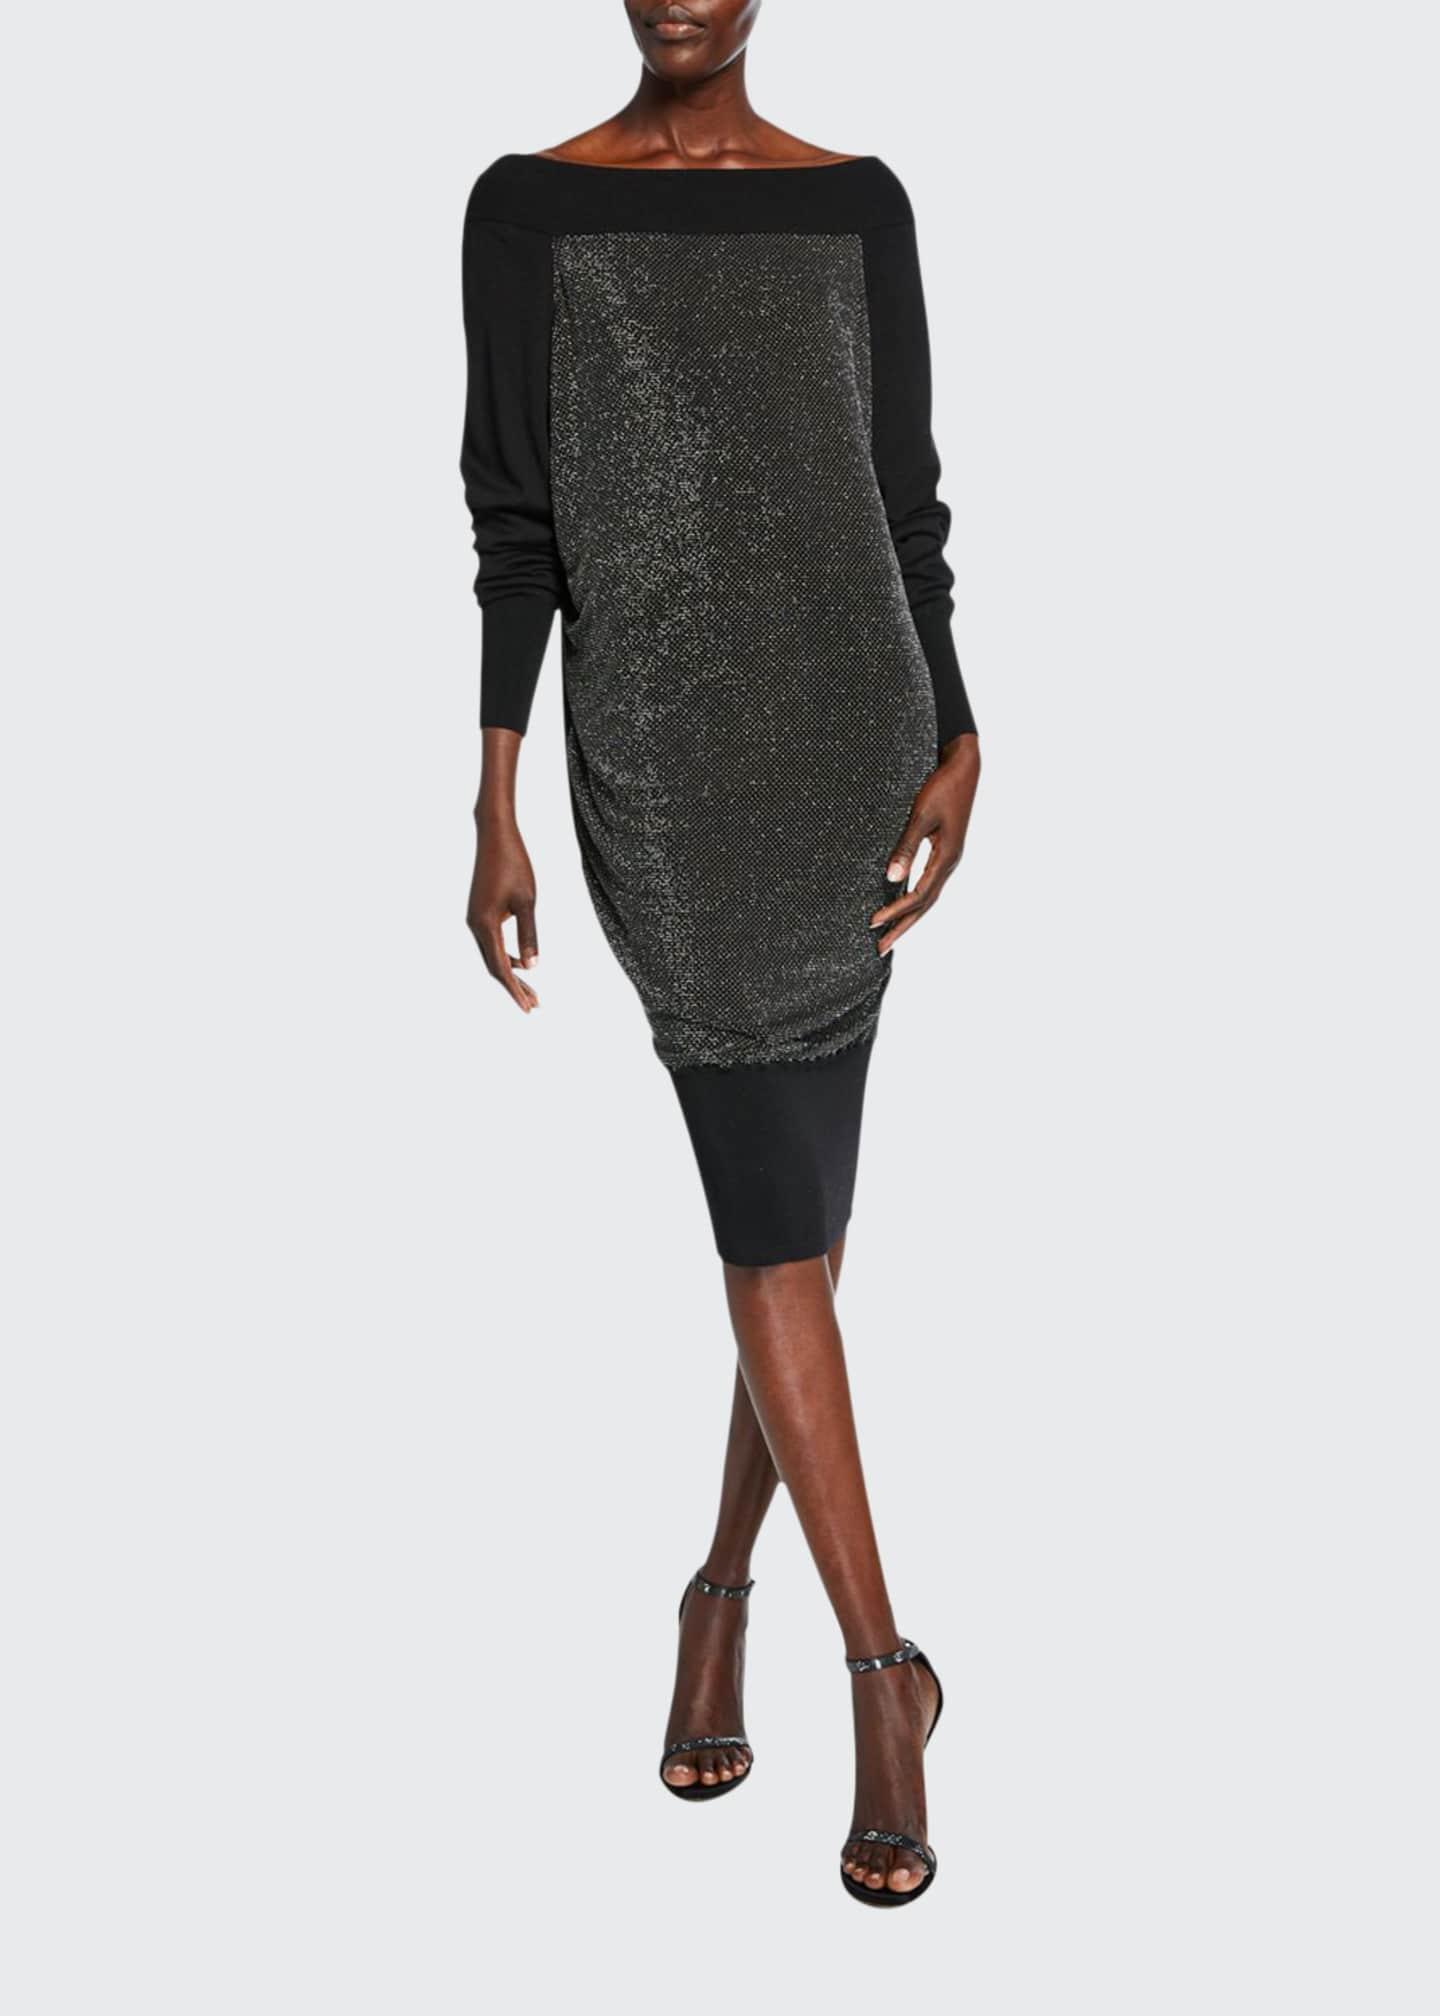 Chiara Boni La Petite Robe Long-Sleeve Metallic Blouson